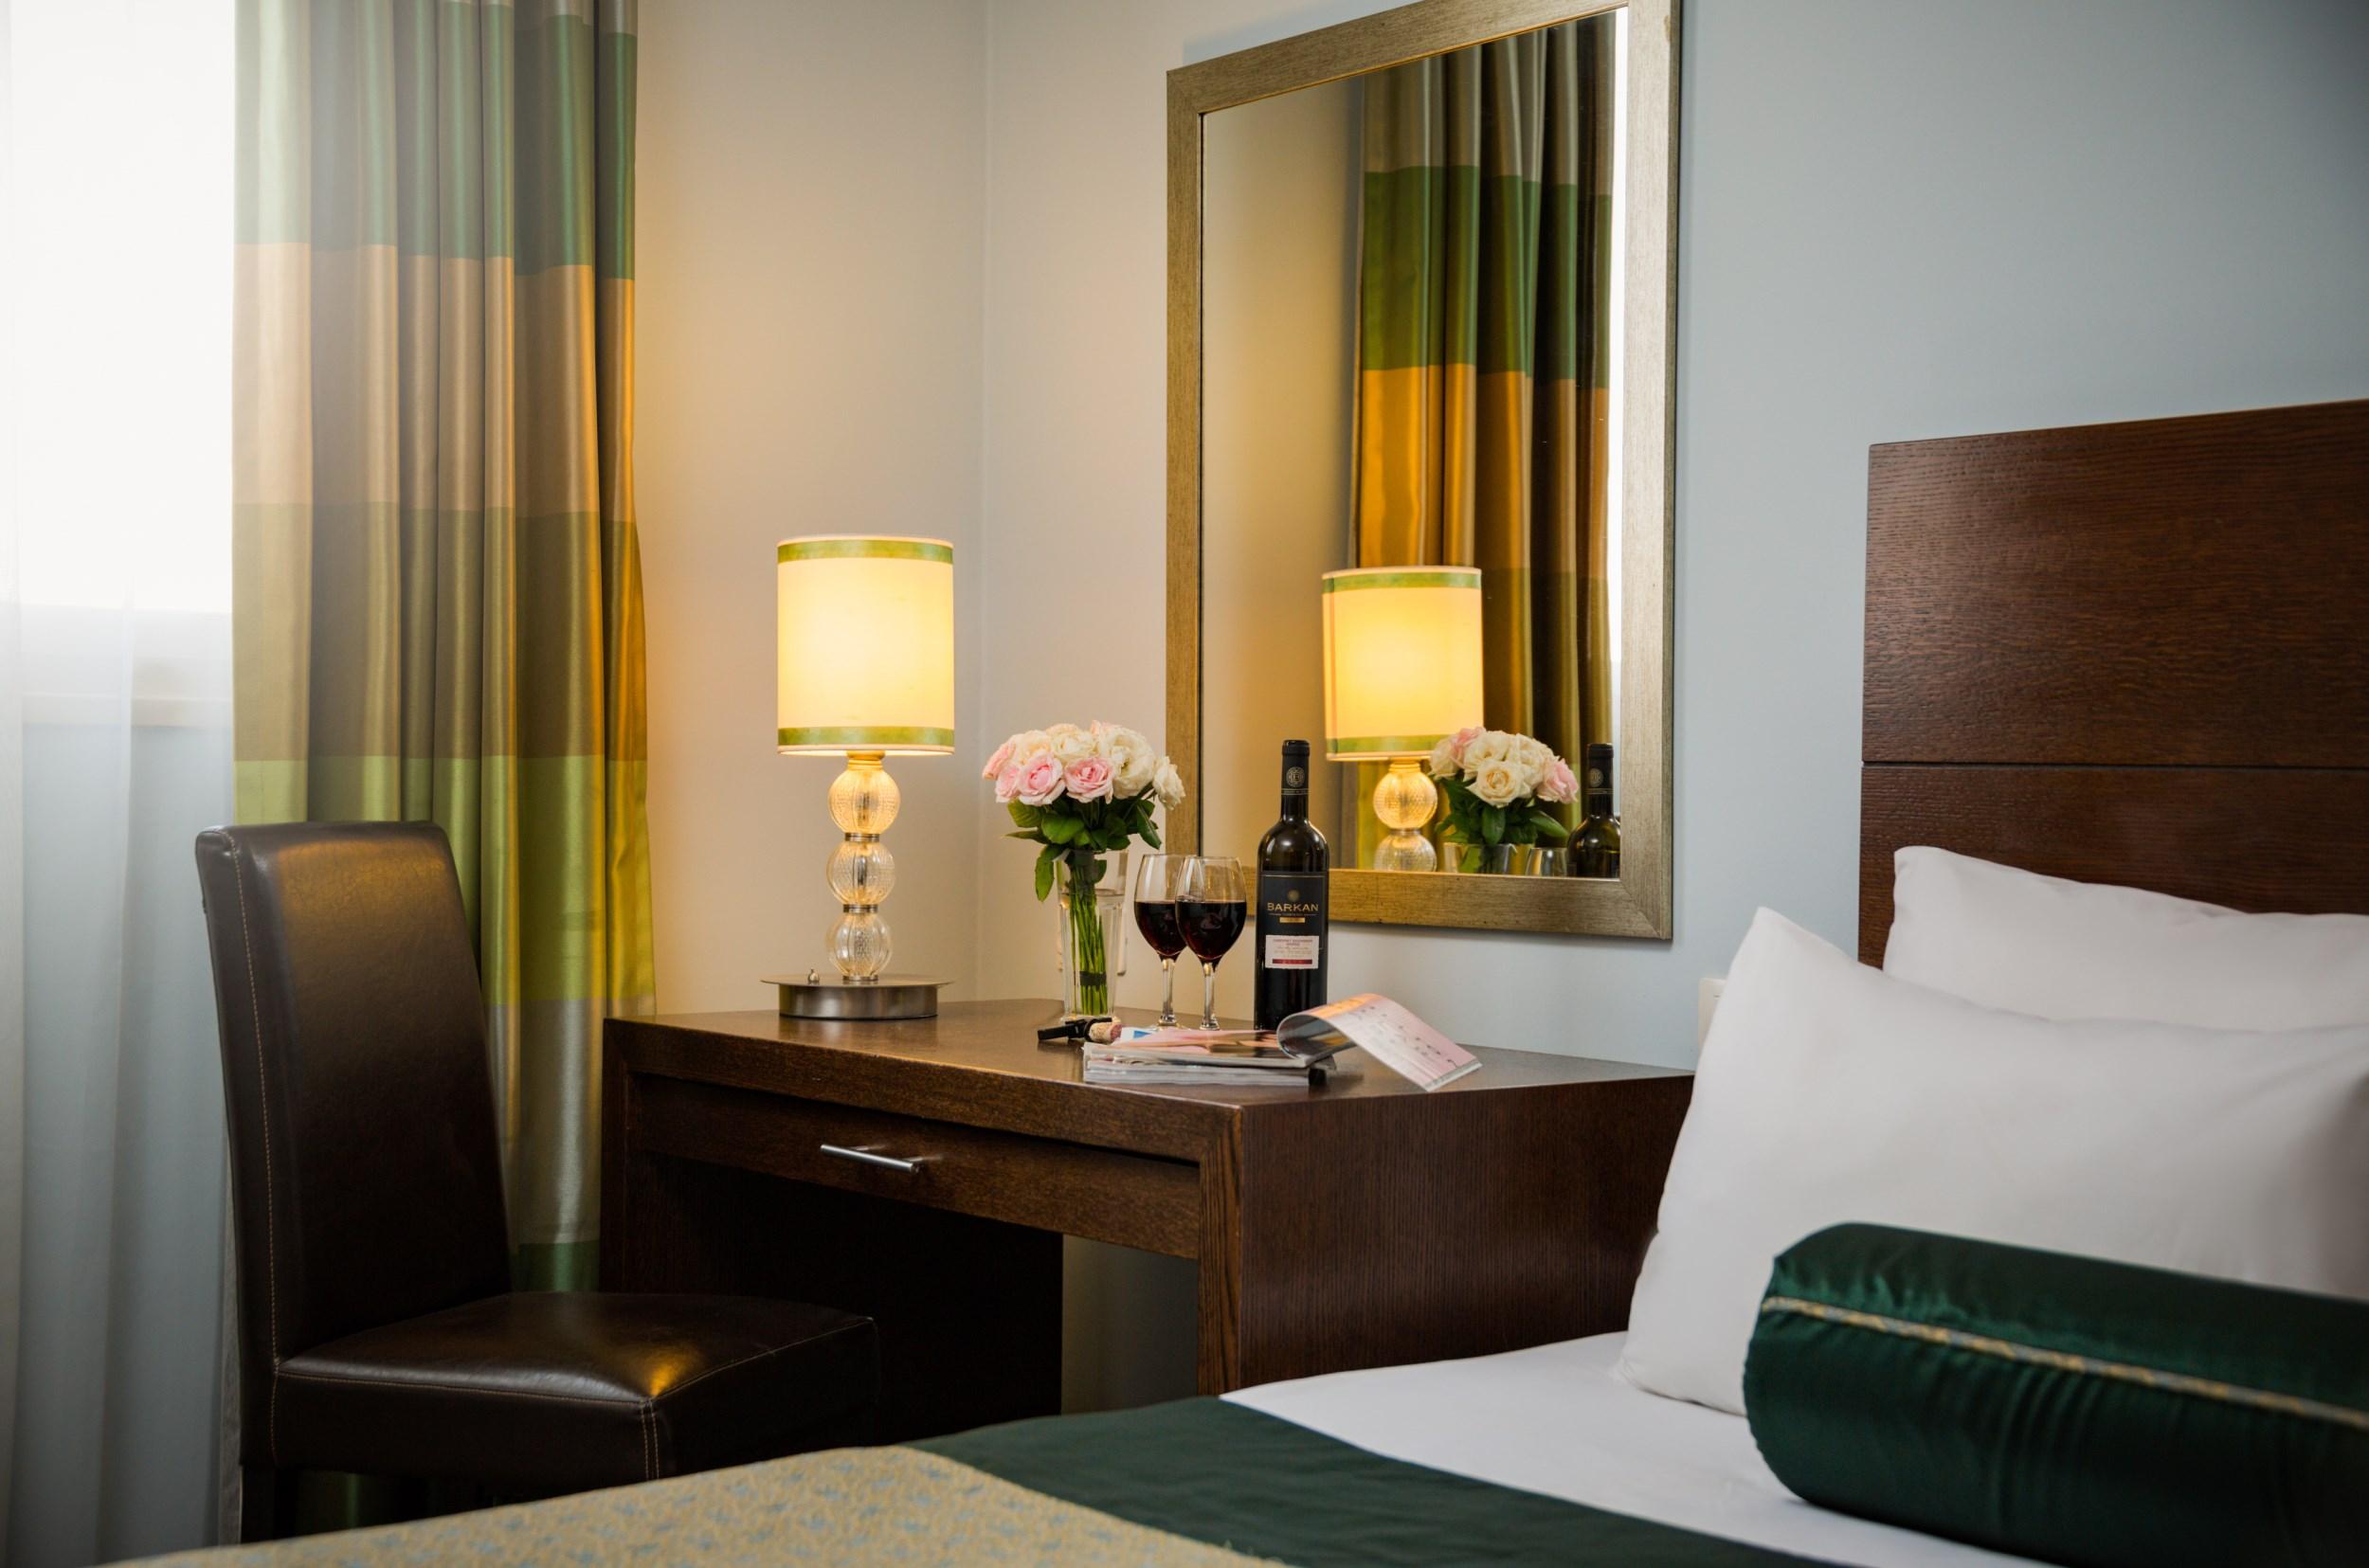 Prima Royale - Delxue Room